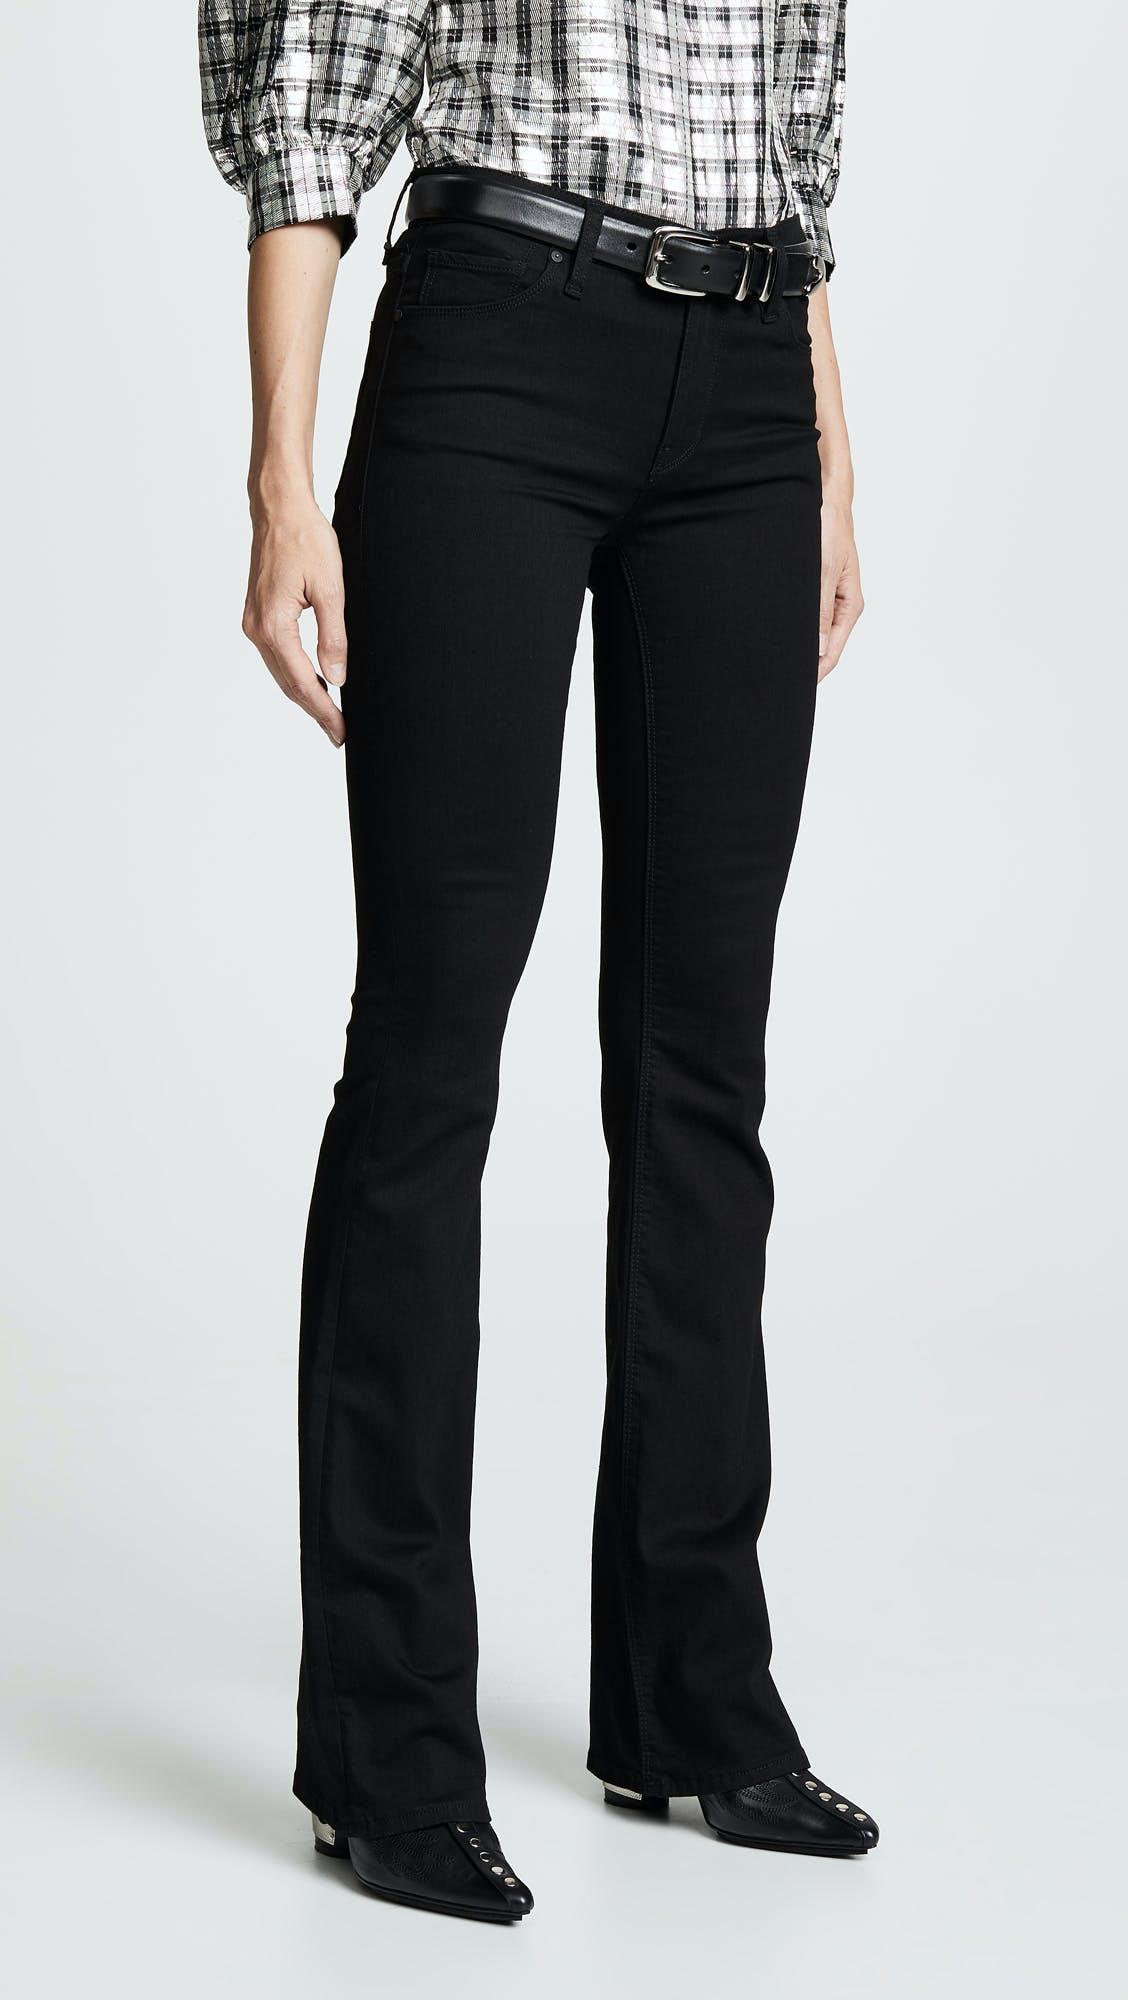 hudson jeans, flare jeans, bootcut jeans, mid rise jeans, black denim